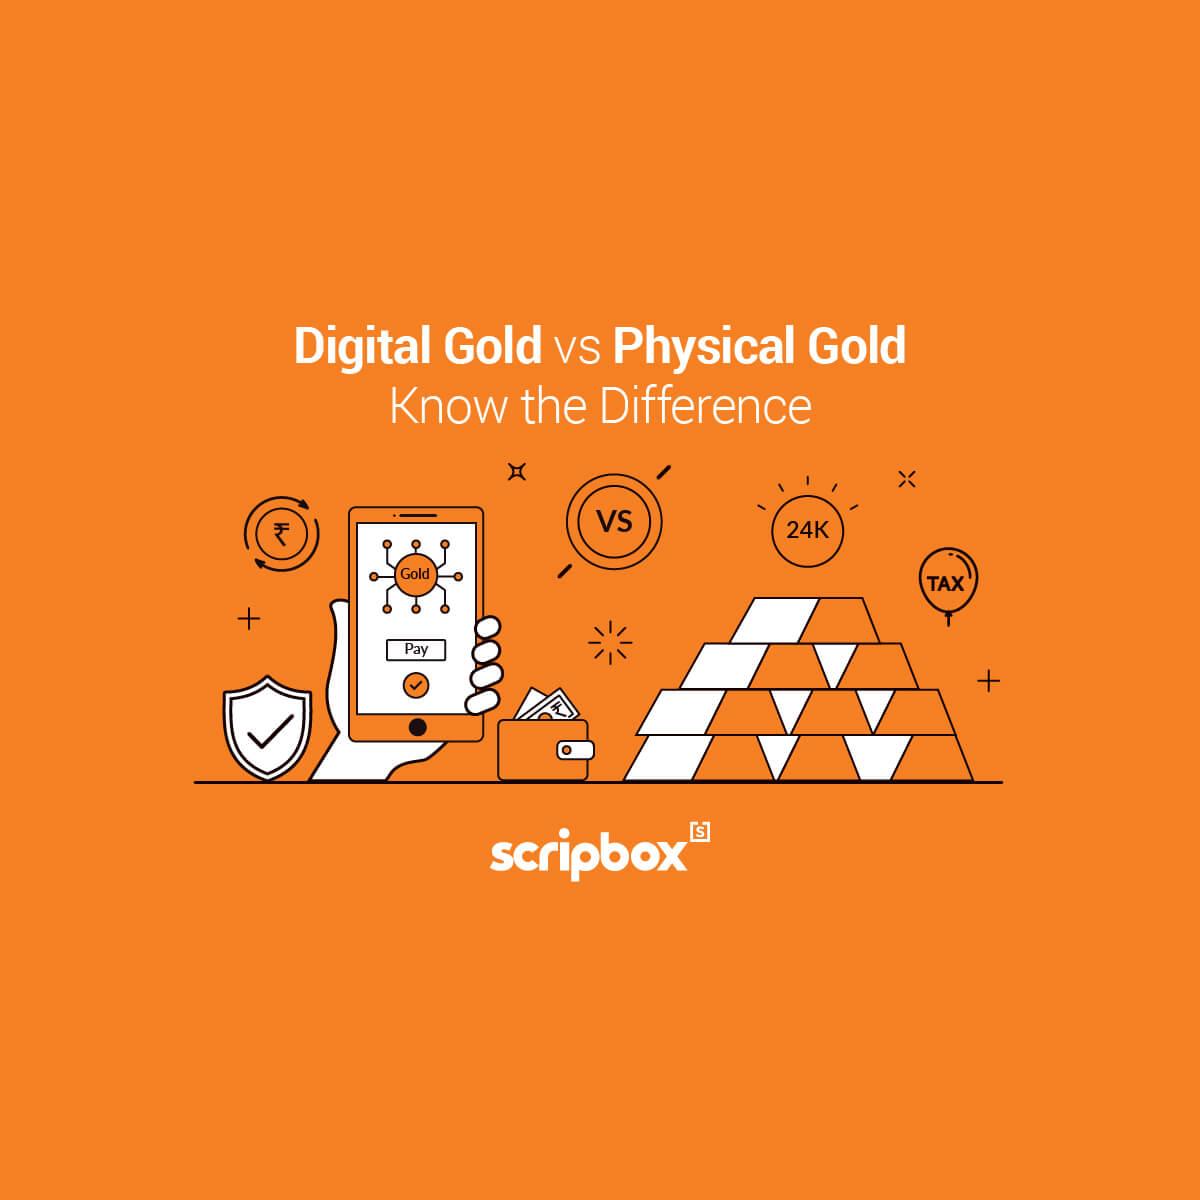 digital gold vs physical gold